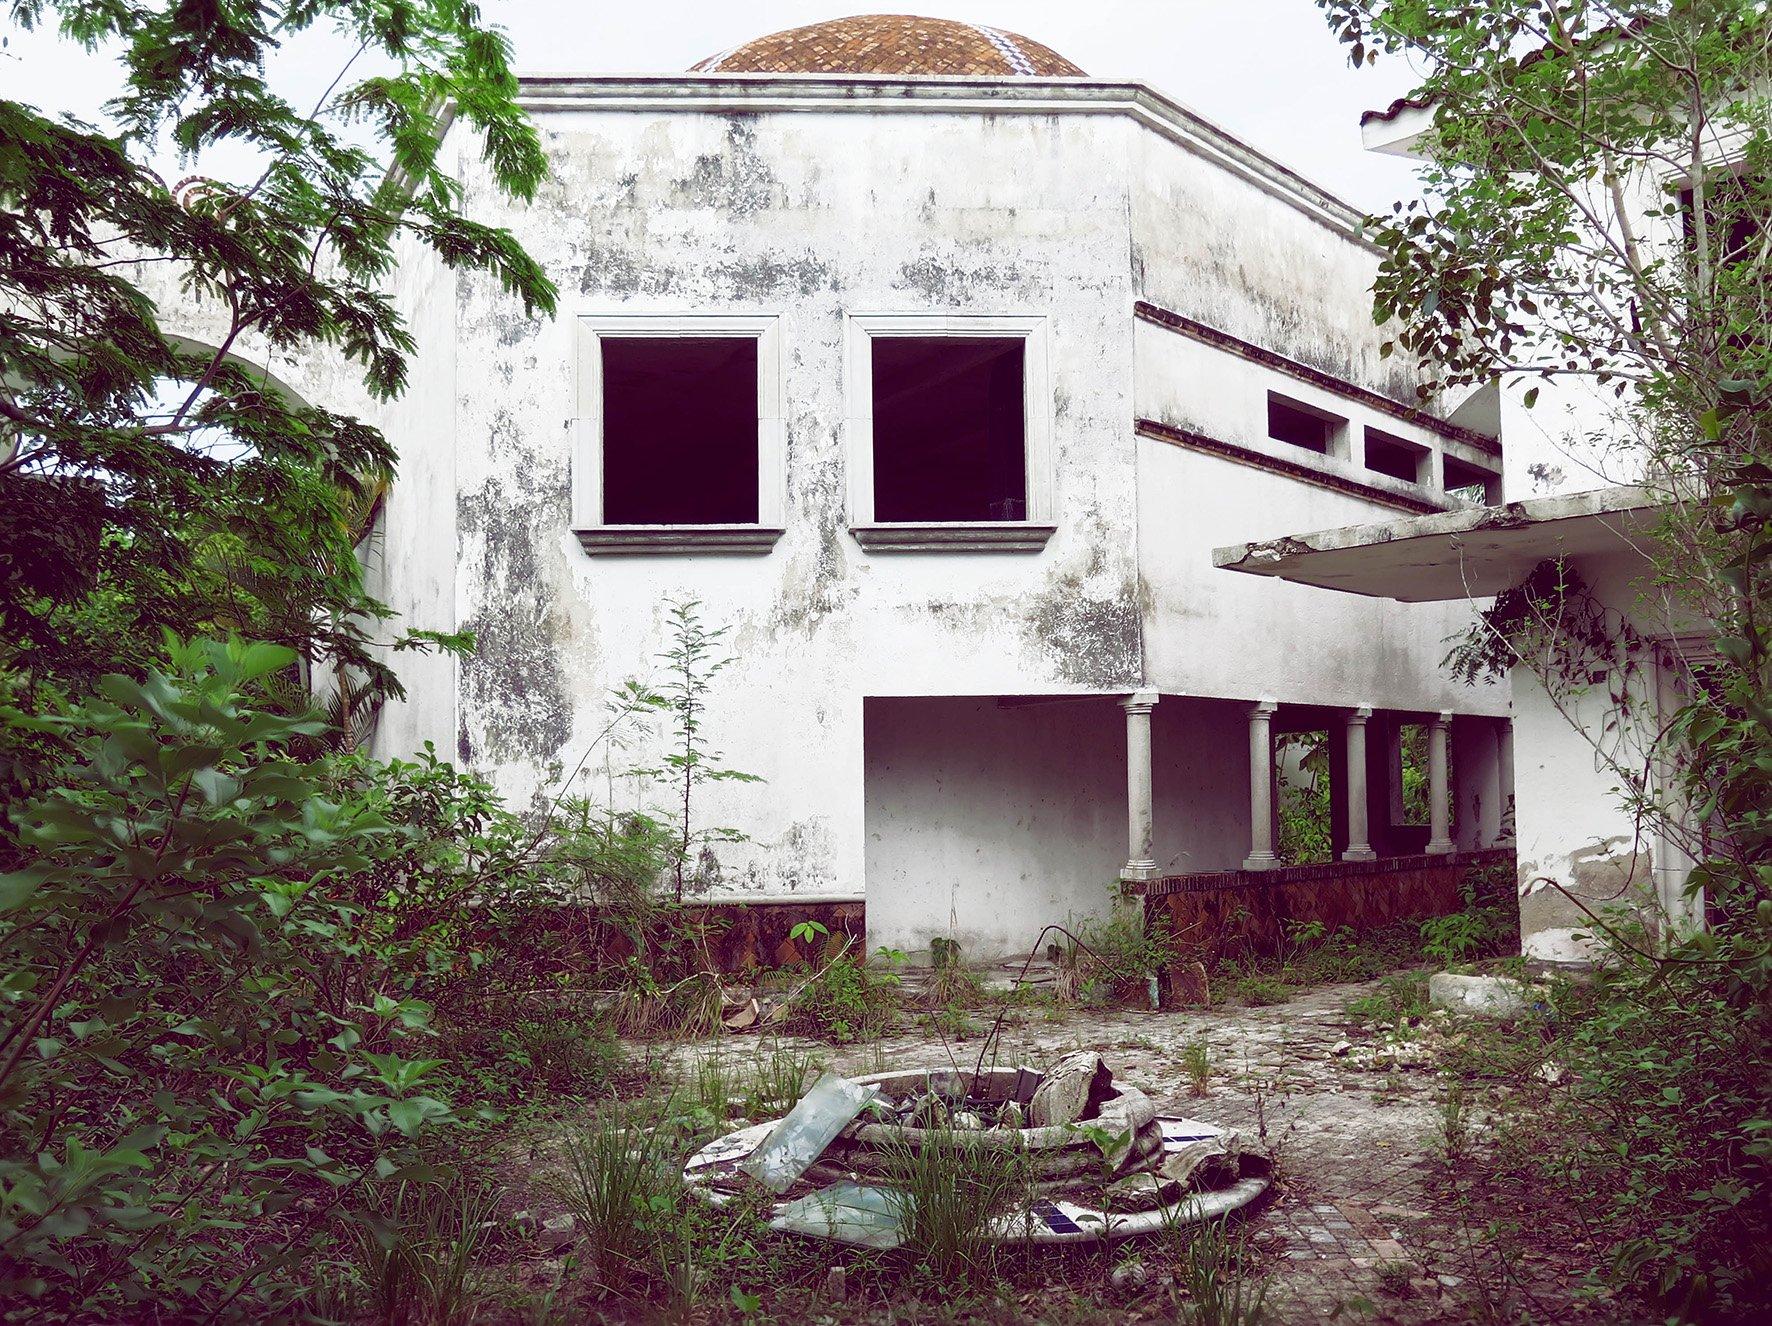 elisabetta riccio - abandoned hotel, The millionaire ruins in Bacalar, Quintana Roo